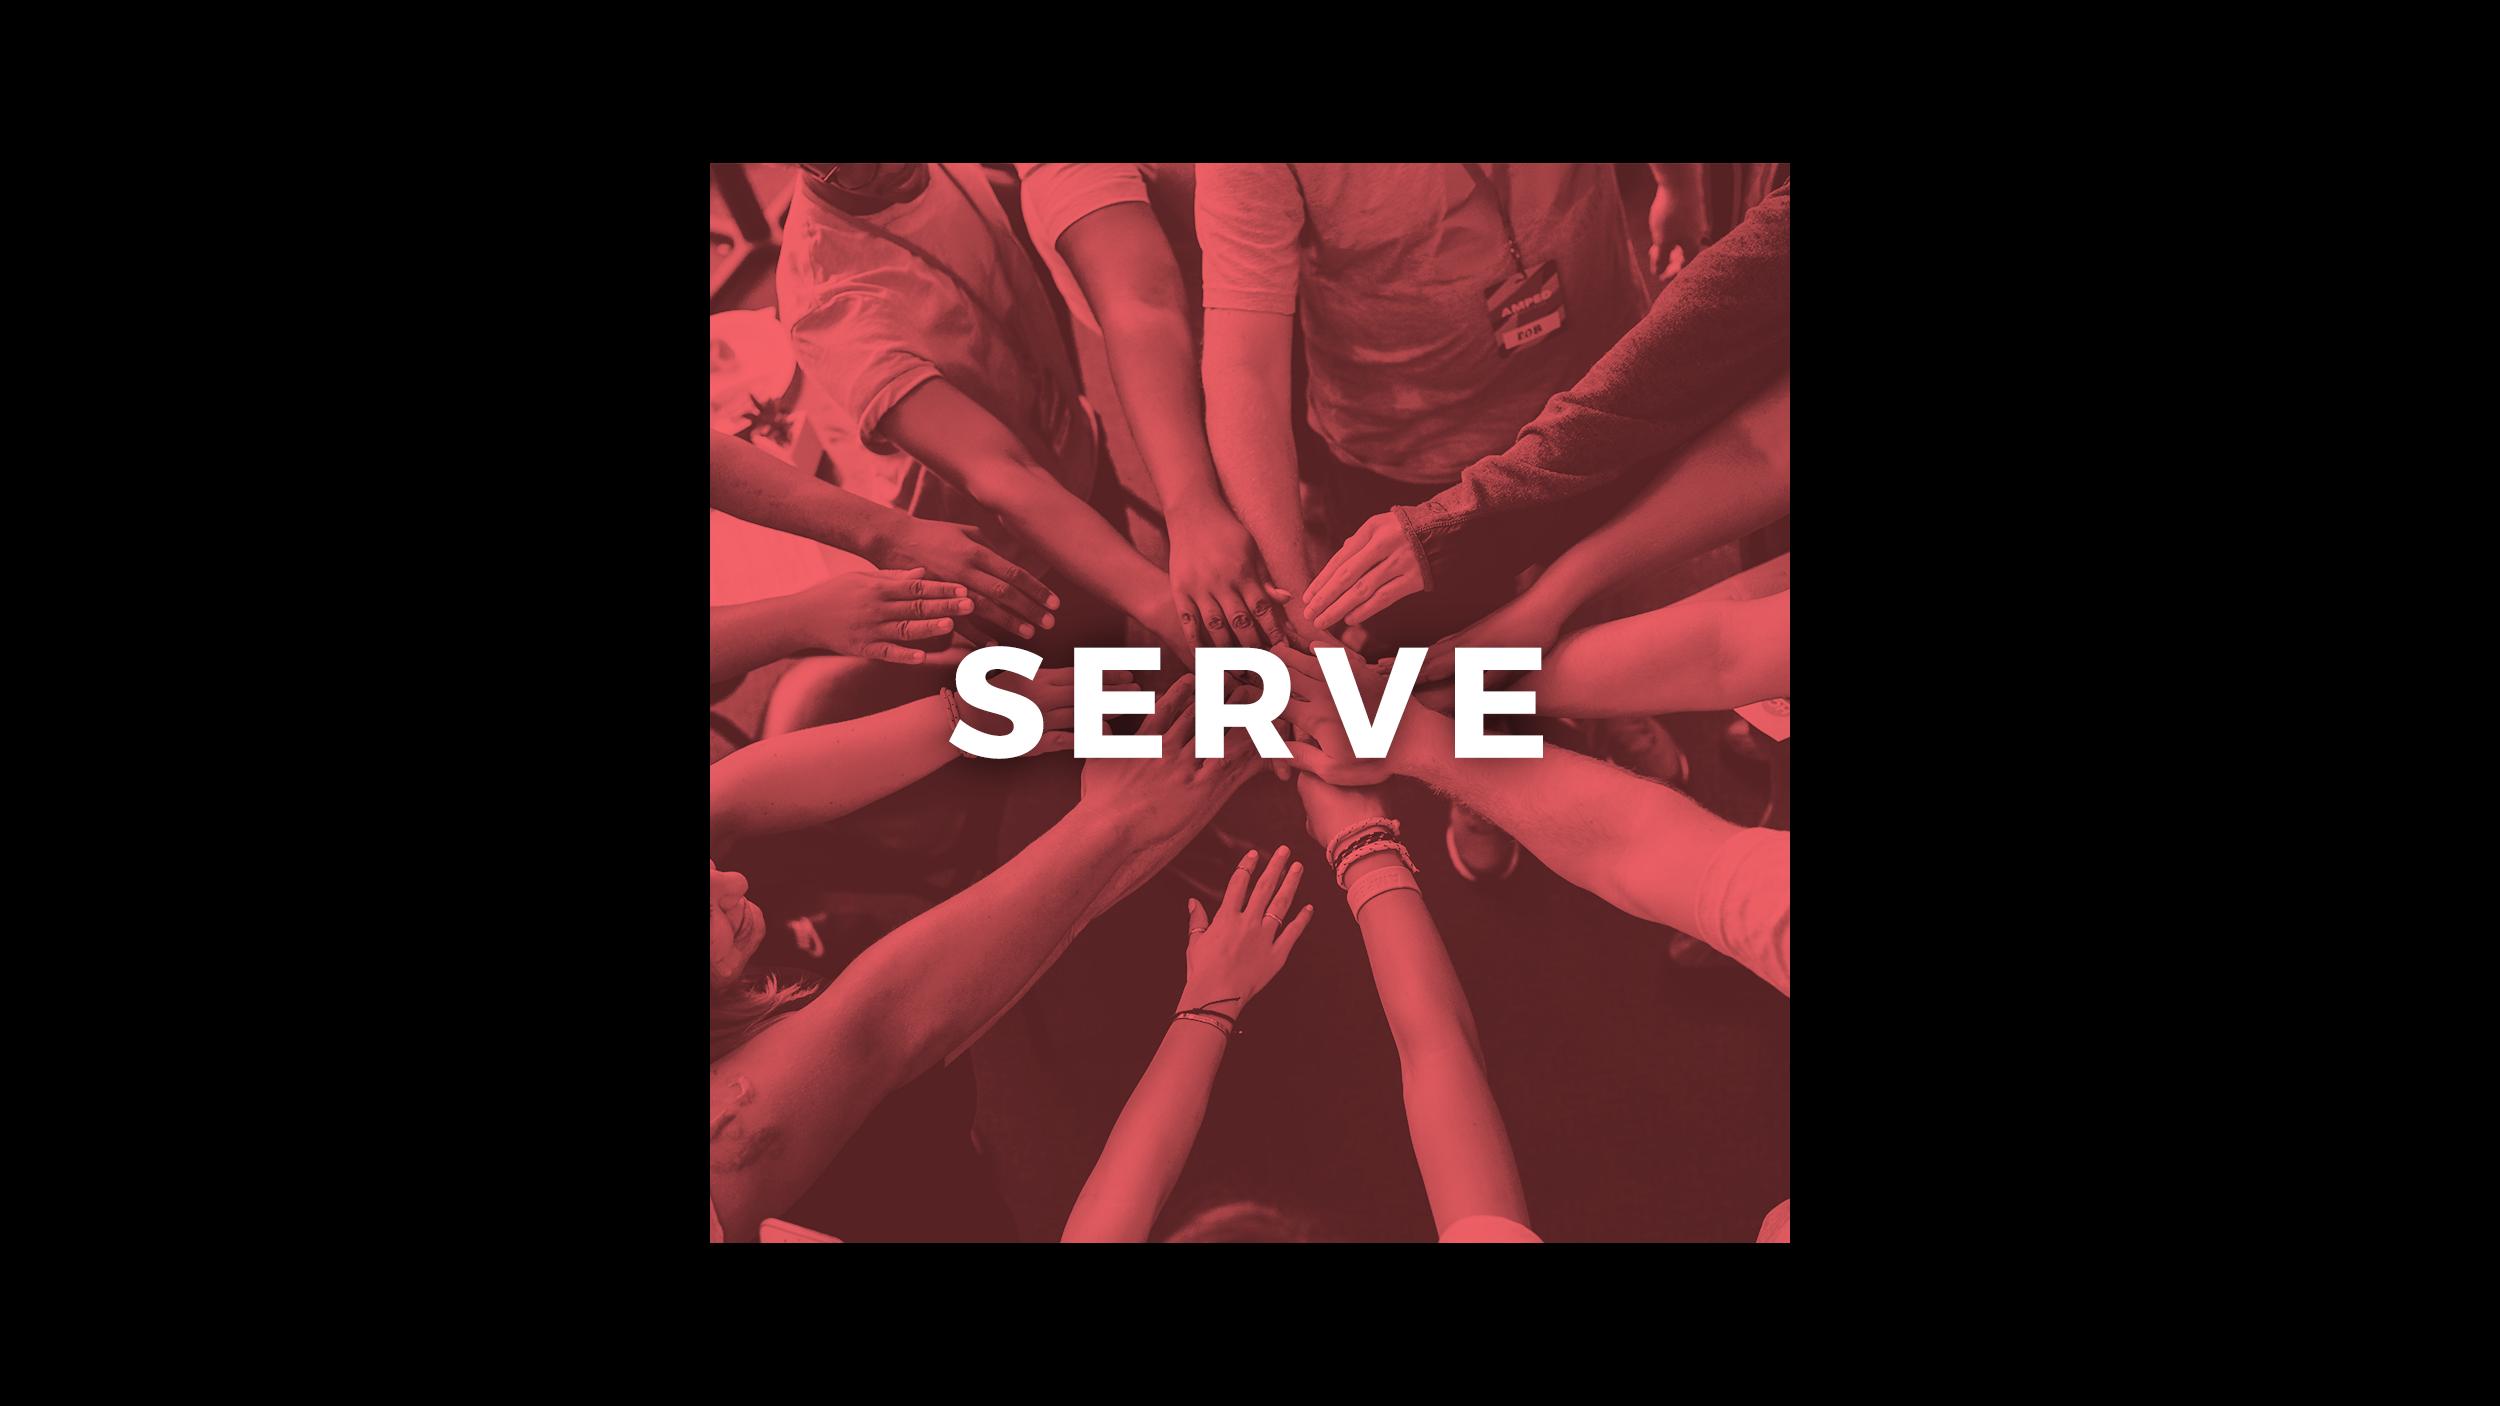 Five Purposes - Serve - 16-9.png